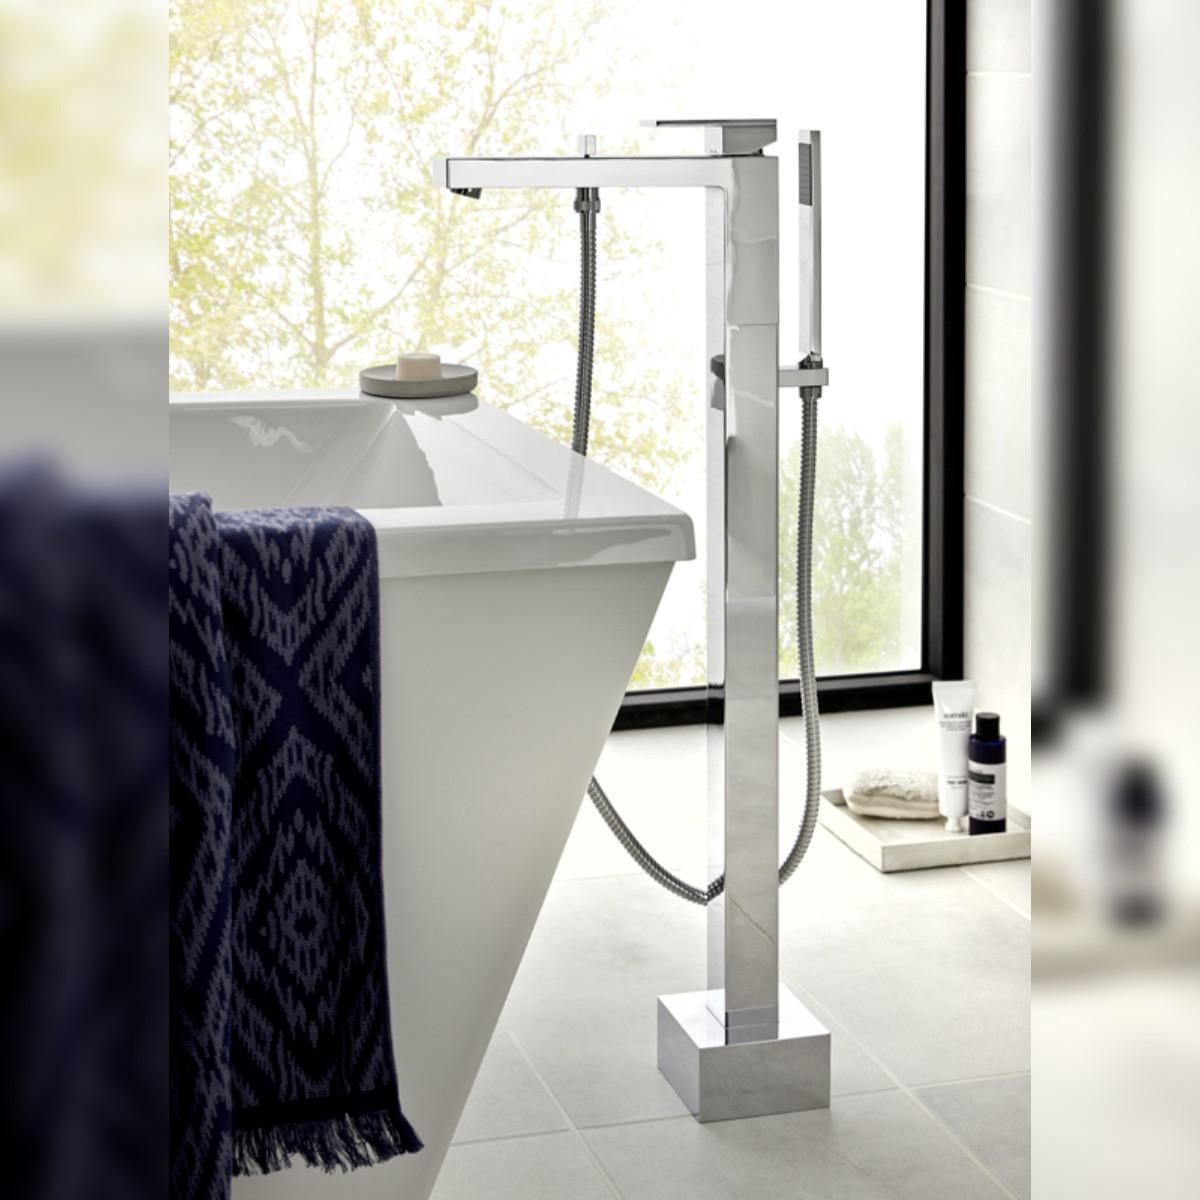 Notion Floor Mounted Bath Shower Mixer